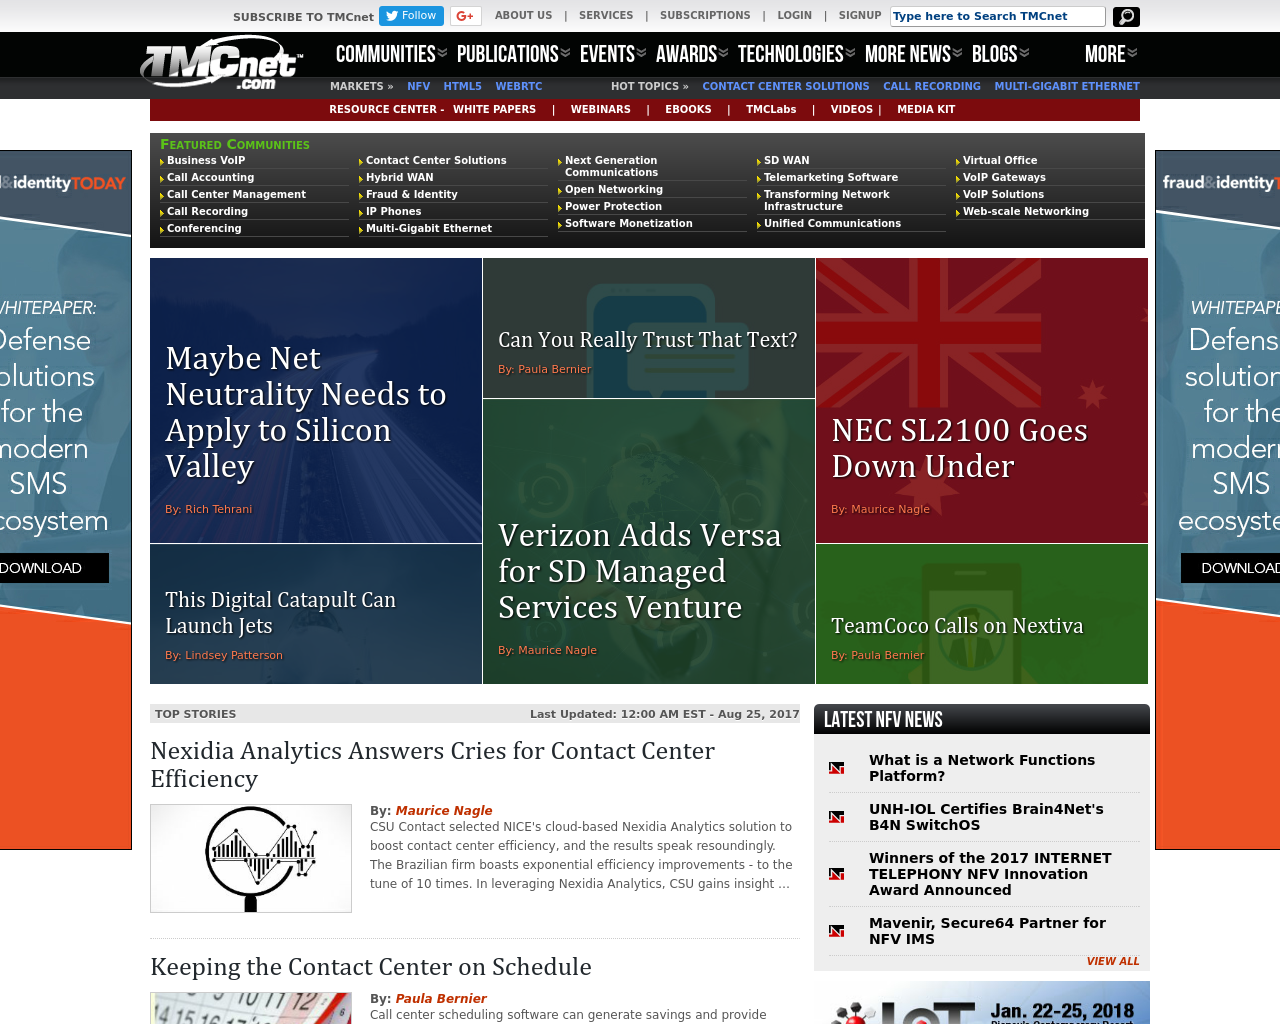 TMCnet-Advertising-Reviews-Pricing